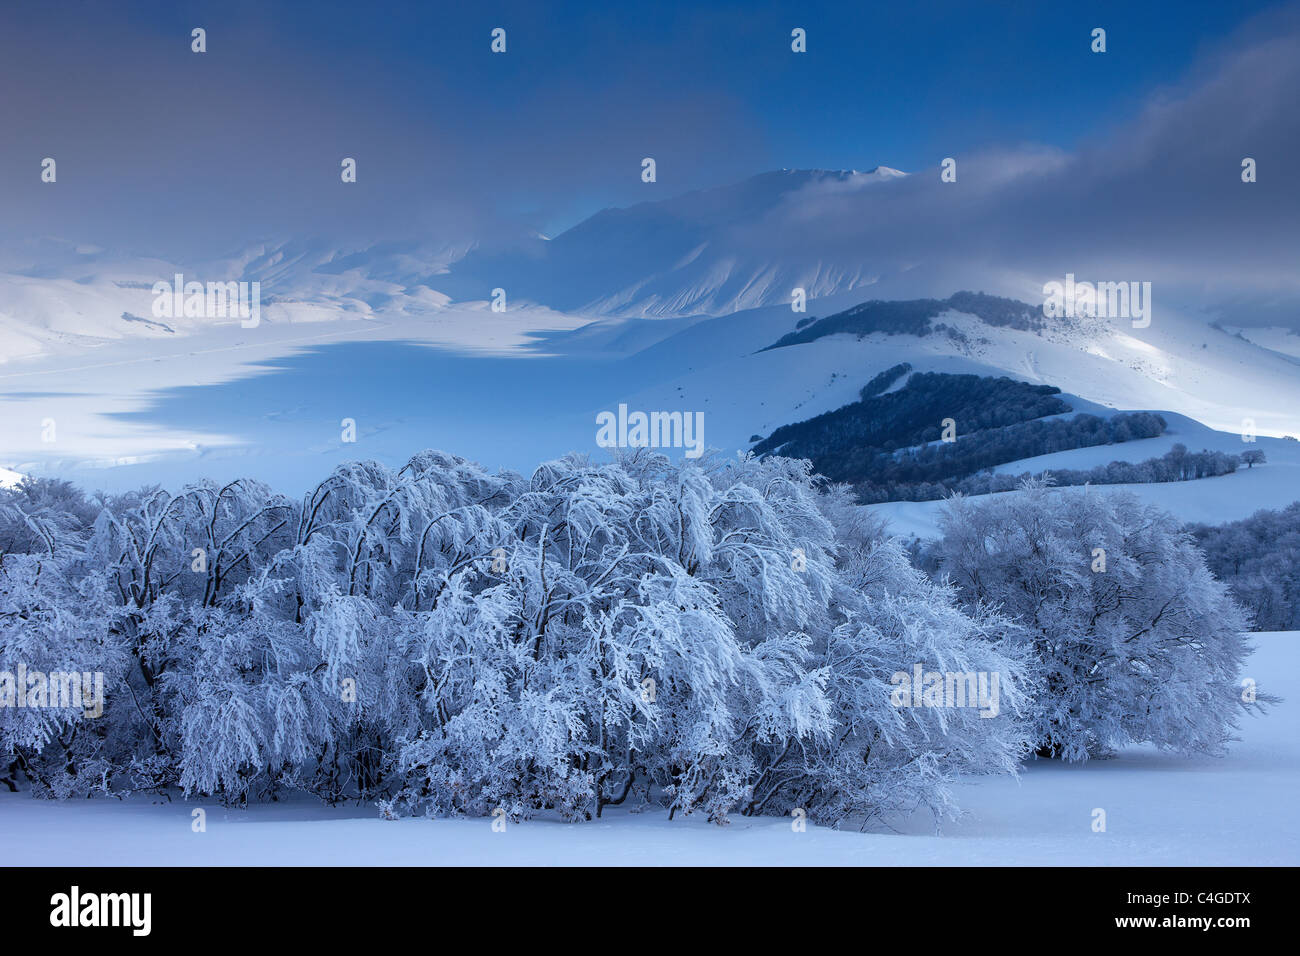 the Piano Grande in winter, Monti Sibillini National Park, Umbria, Italy - Stock Image